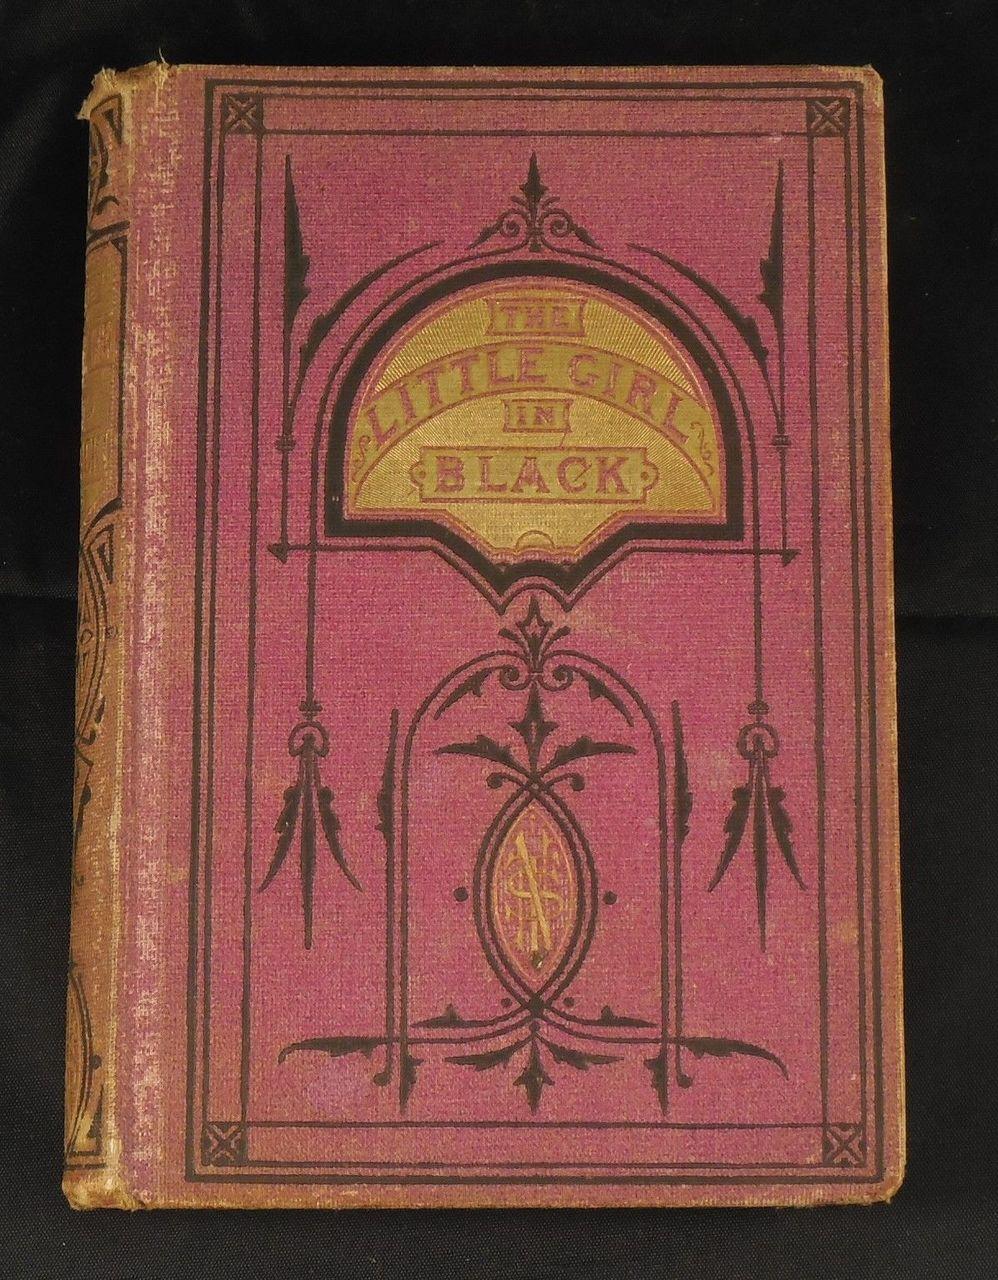 THE LITTLE GIRL IN BLACK, by Margaret K. Wilmer 1873 National Temperance Society